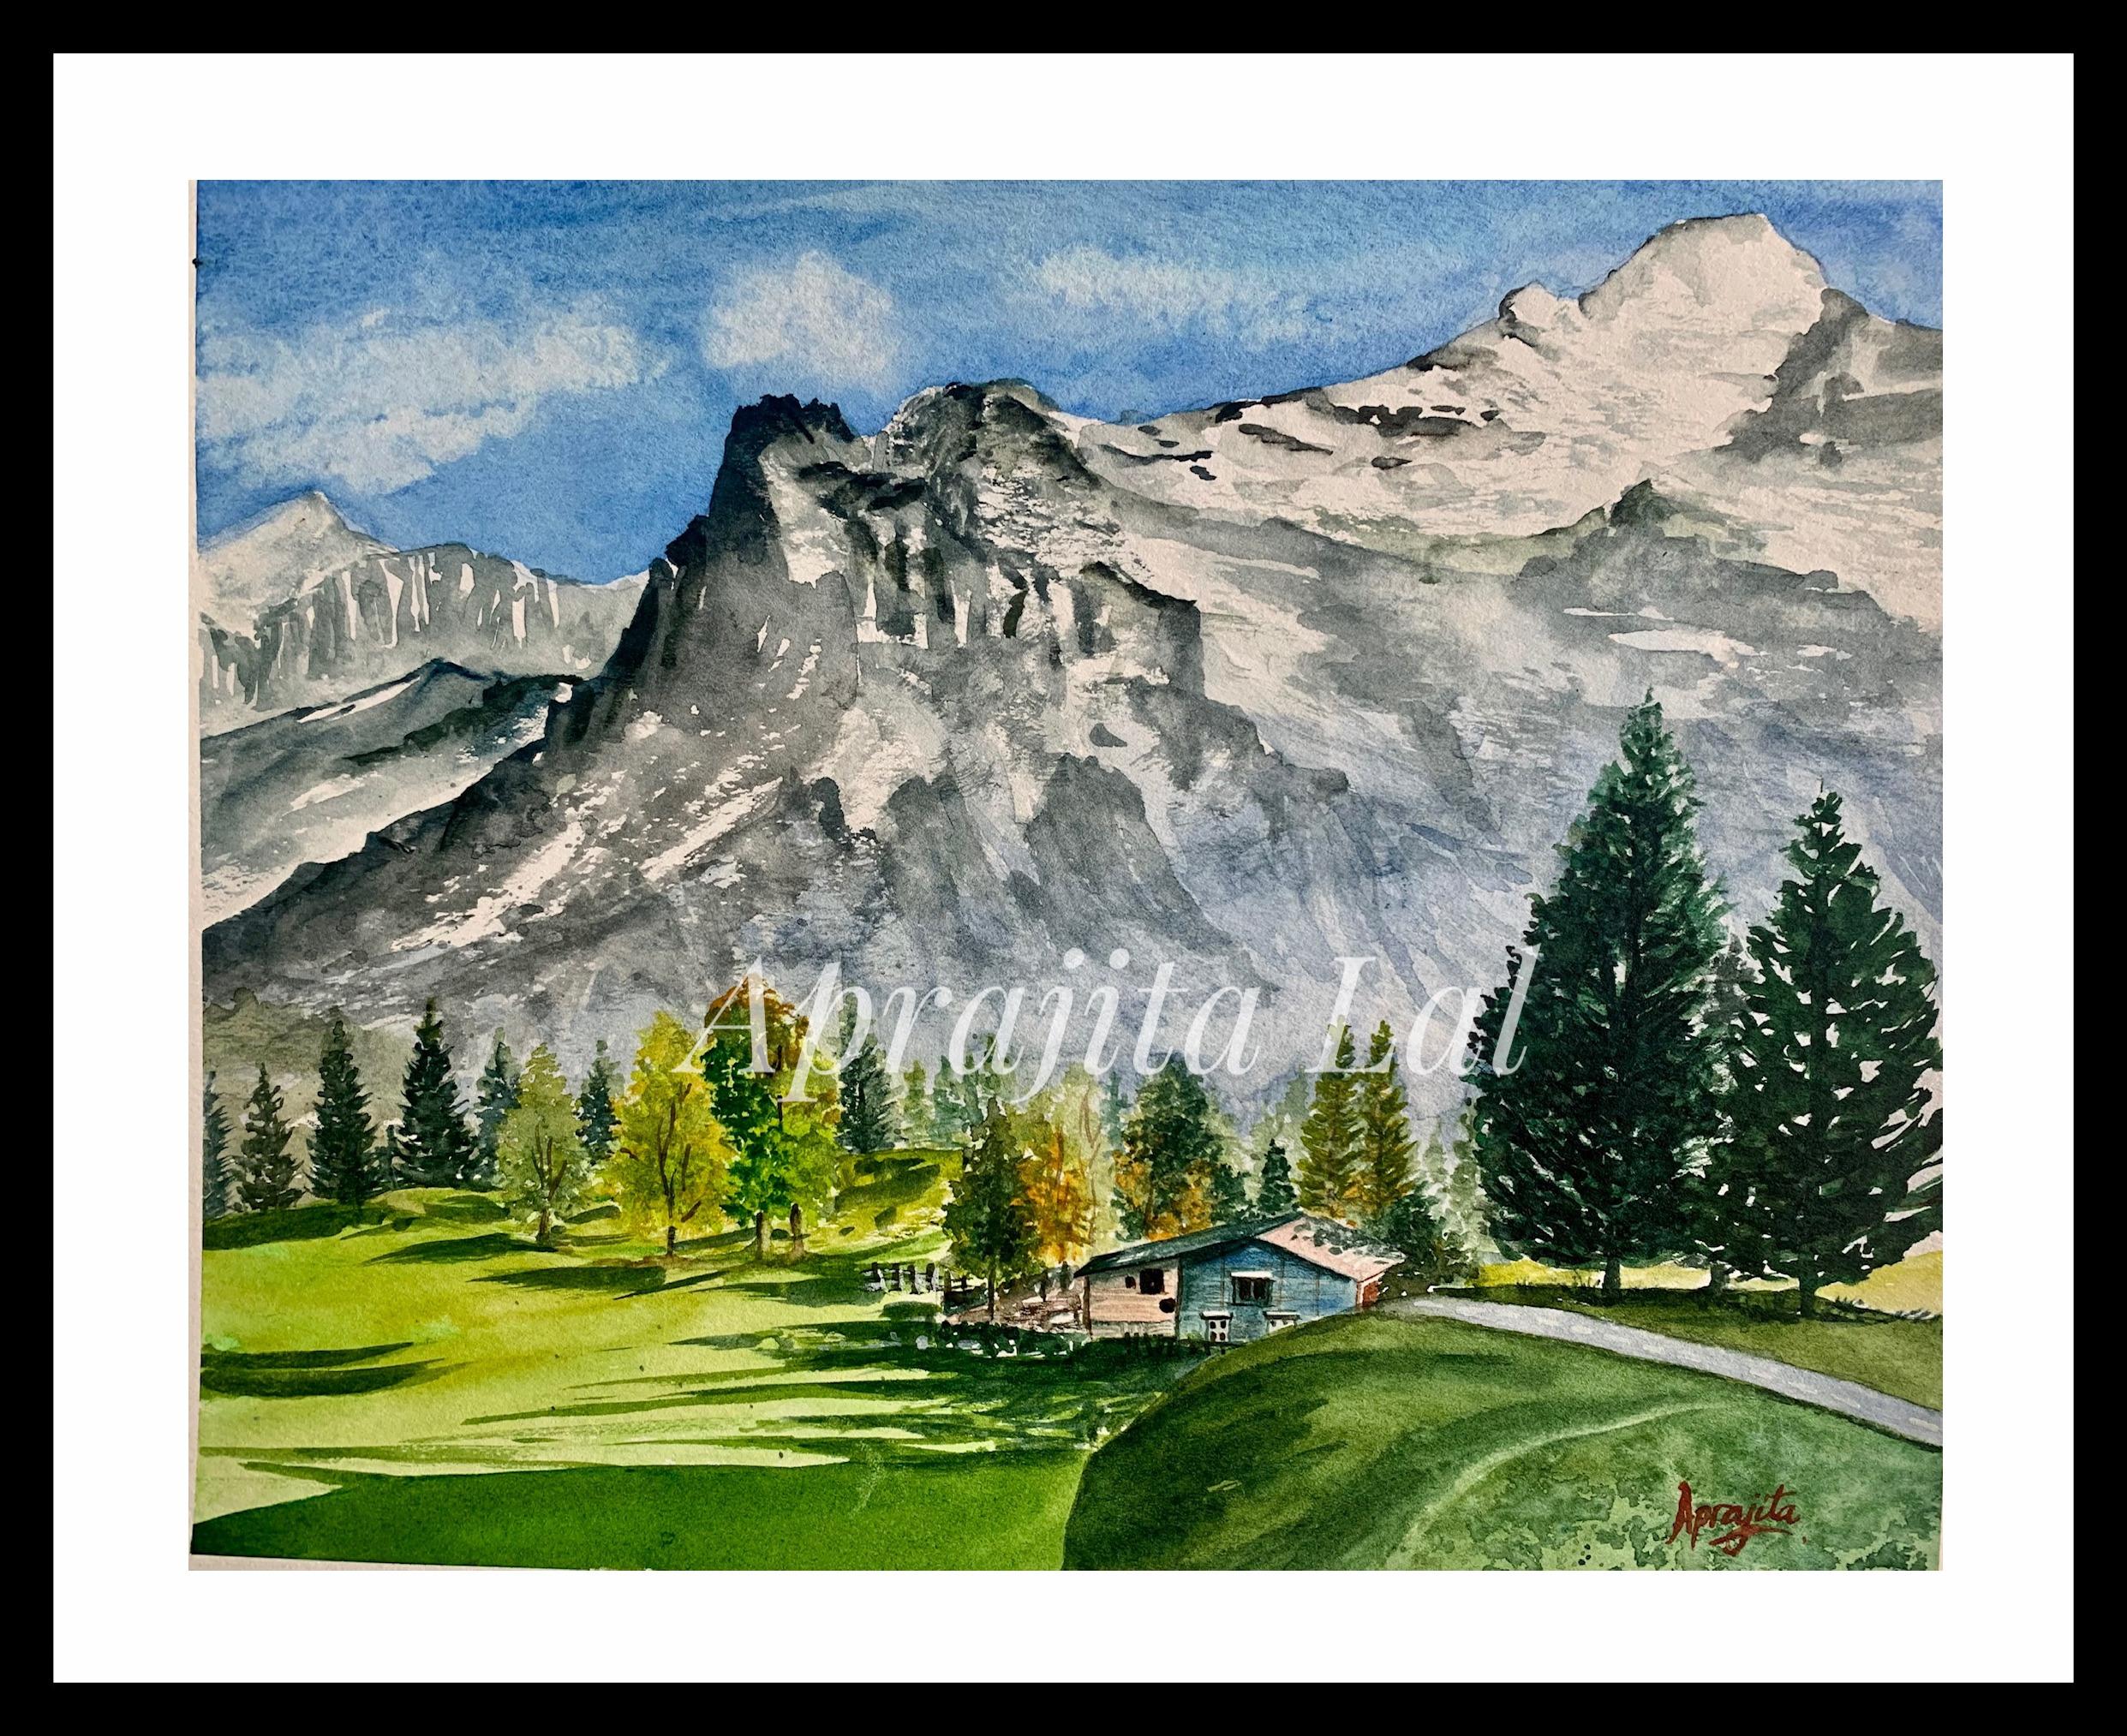 Alpine valley original ysgfu3